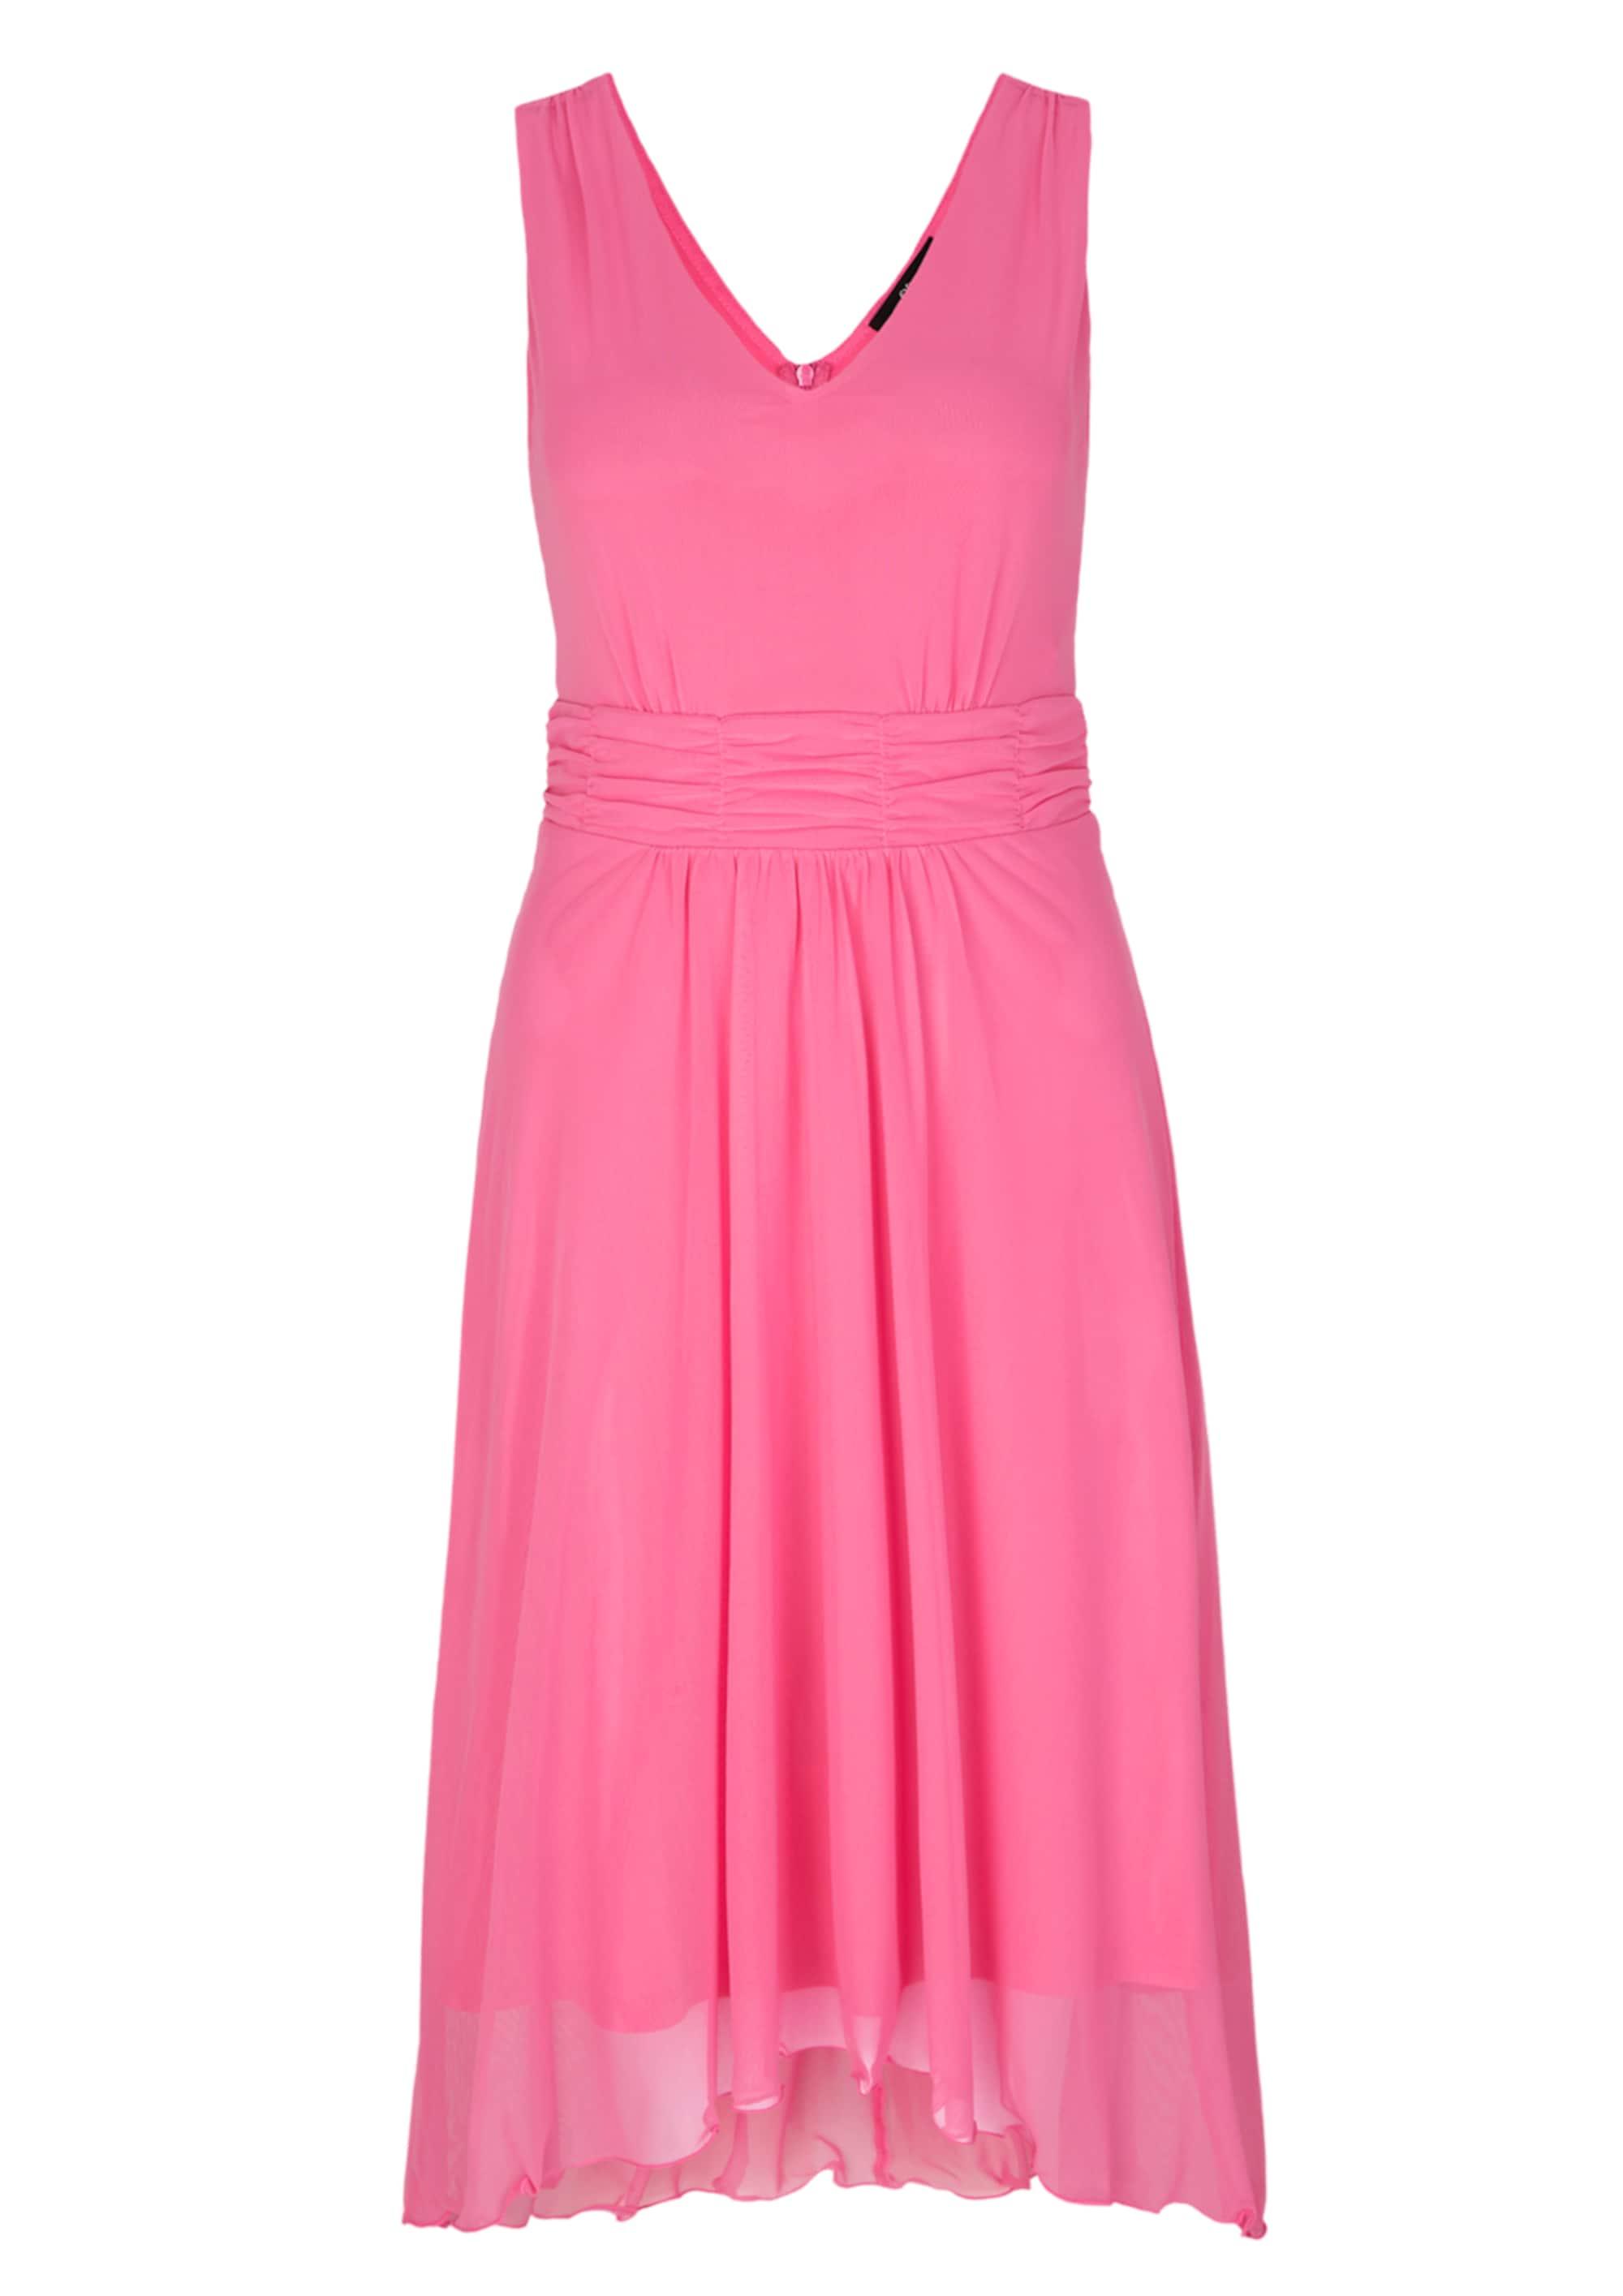 Mesh-Kleid mit High-Low-Saum